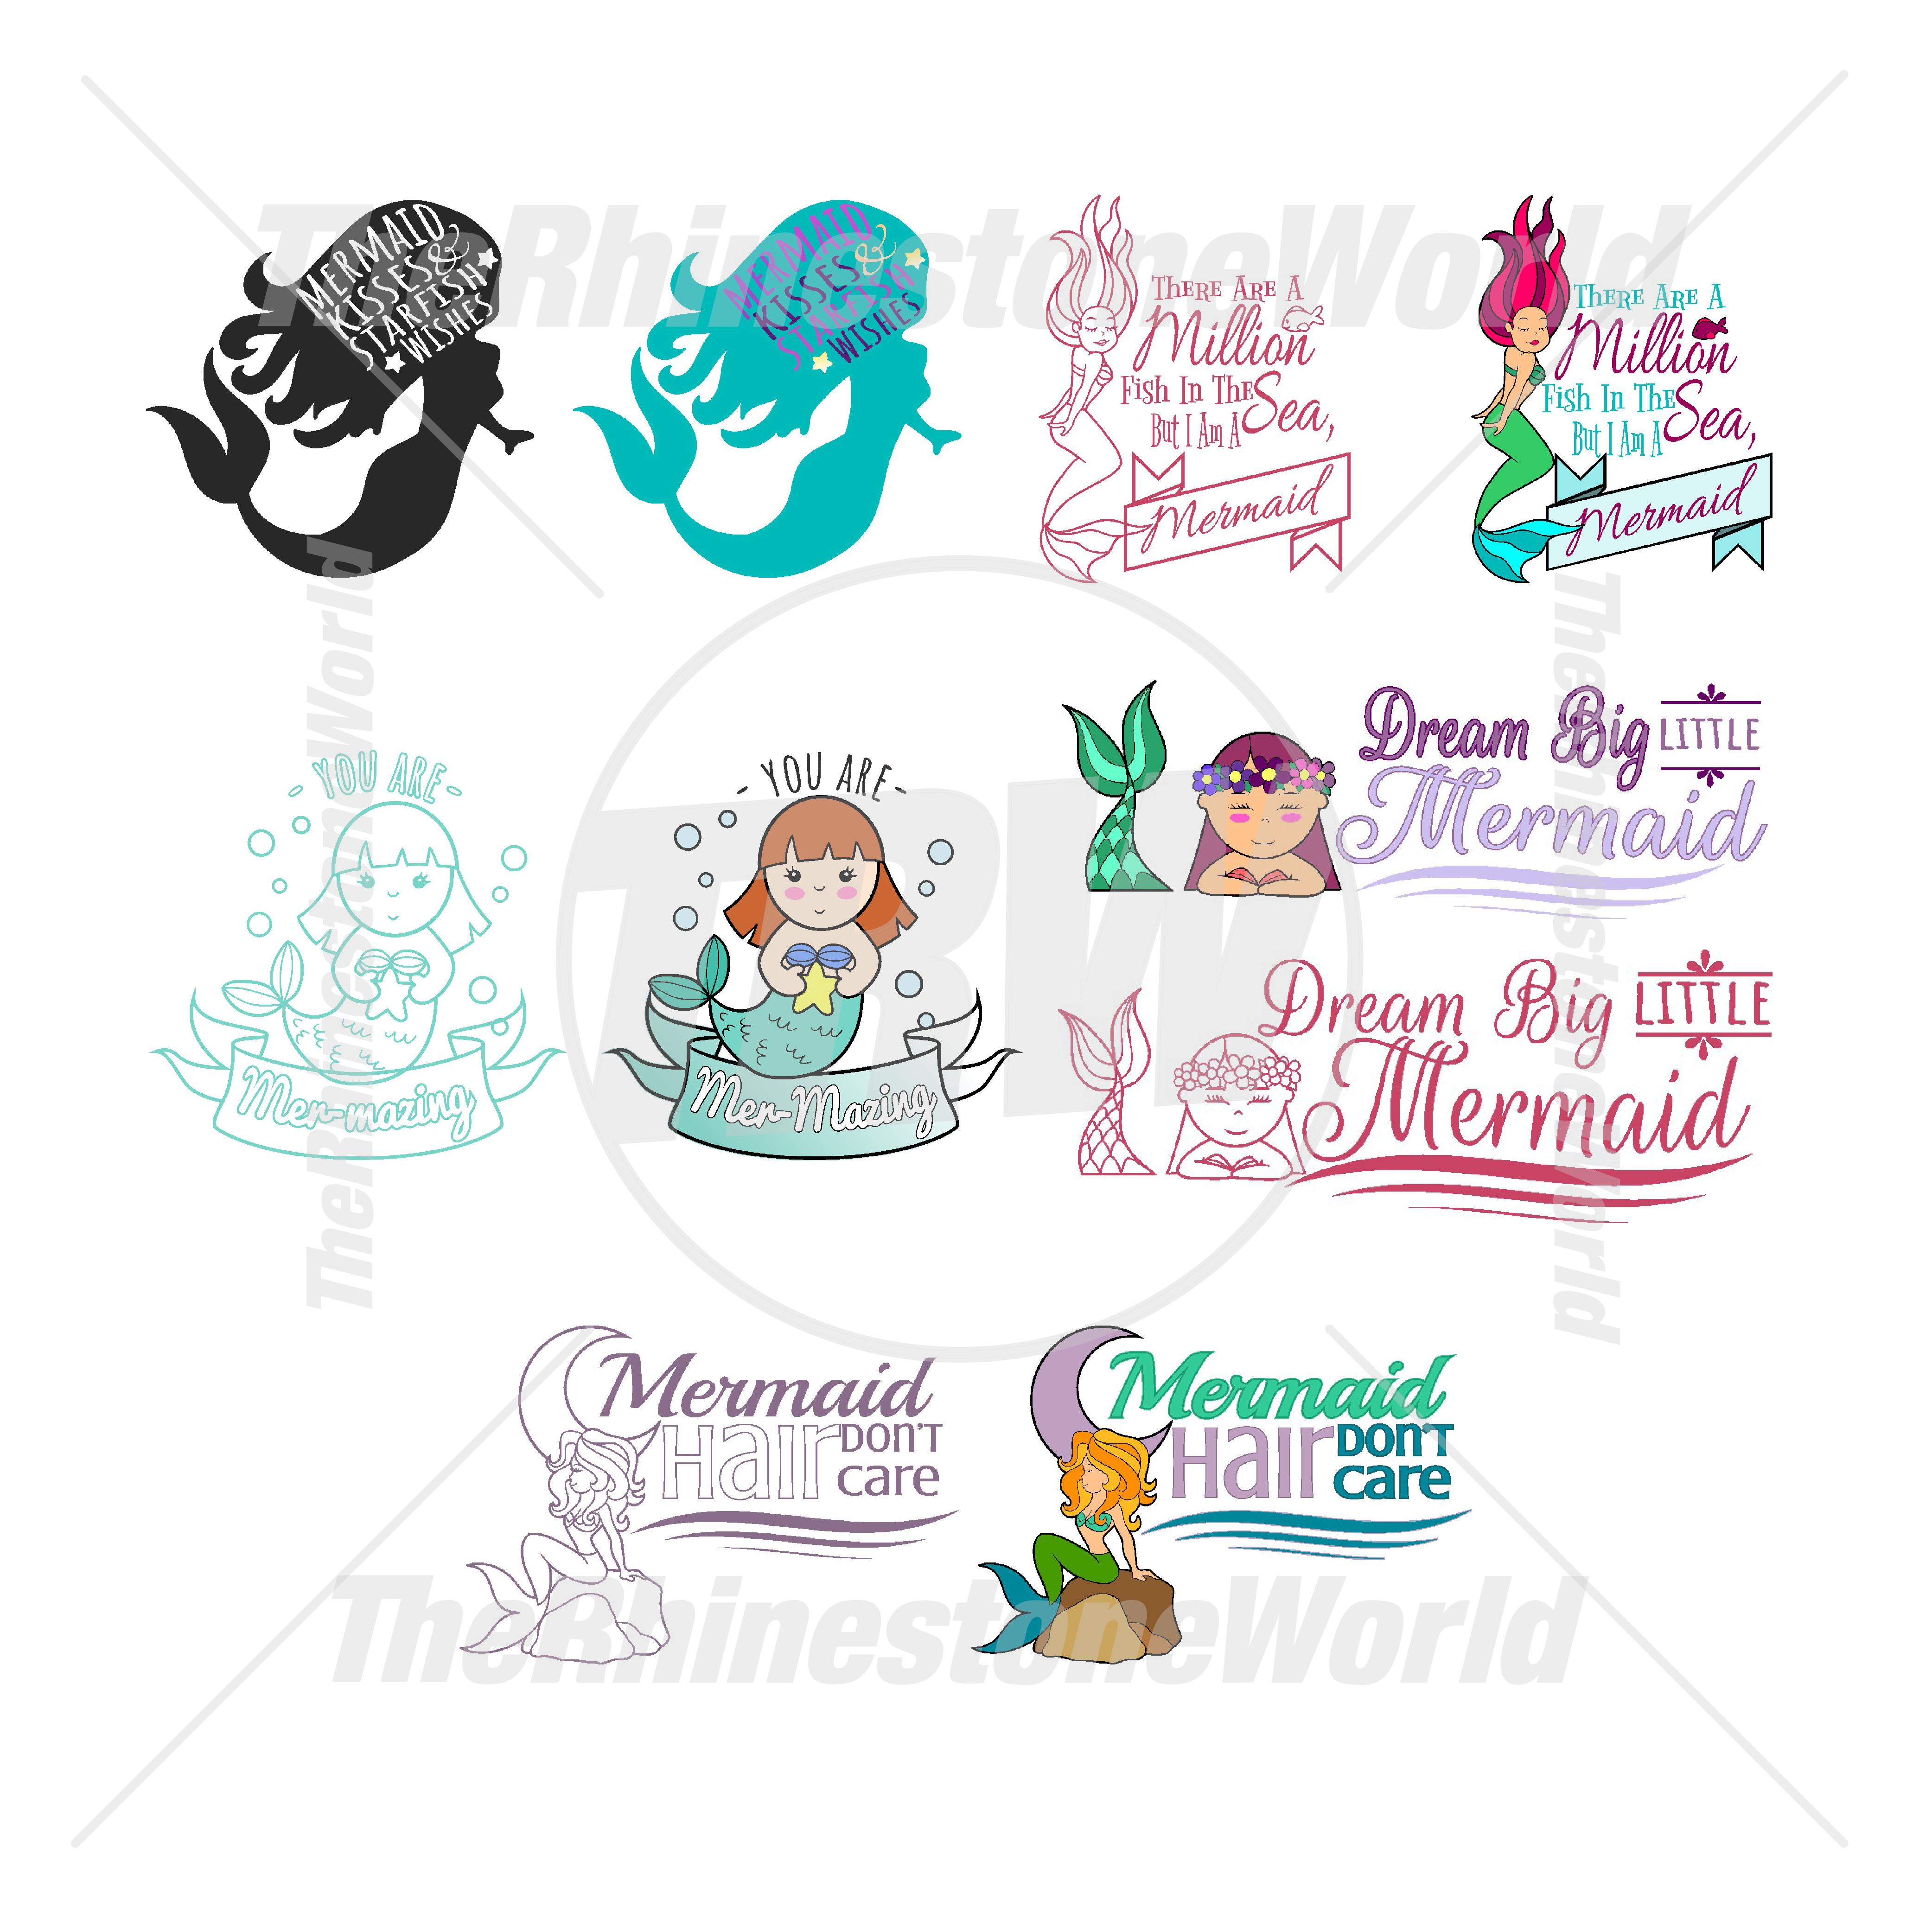 mermaid live template mini pack 1